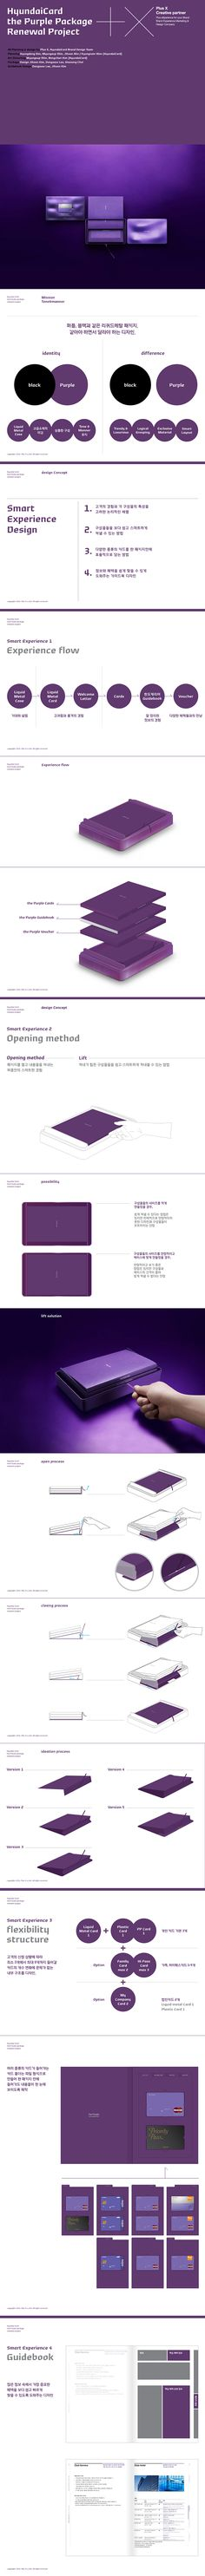 https://www.behance.net/gallery/7472645/HyundaiCard-the-Purple-Package-eXperience-Design-2011